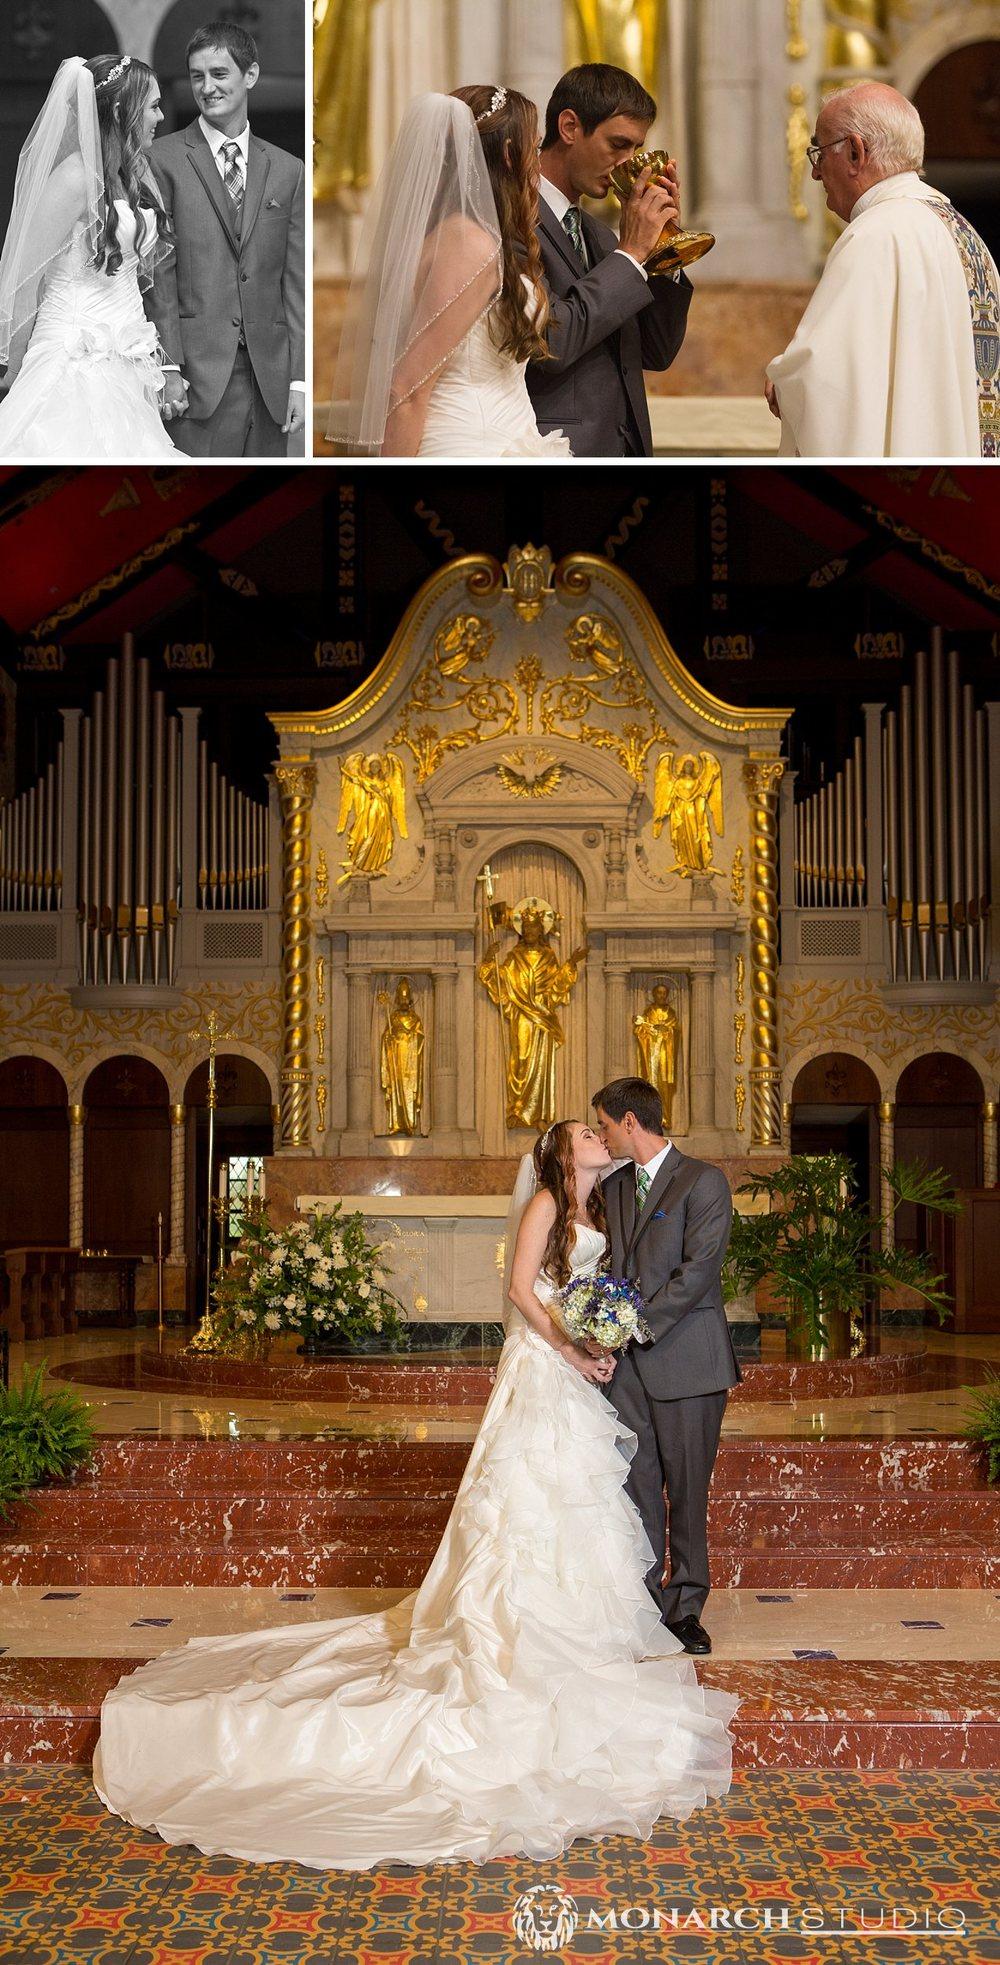 Treasury-on-The-Plaza-Wedding-Reception_0022.jpg